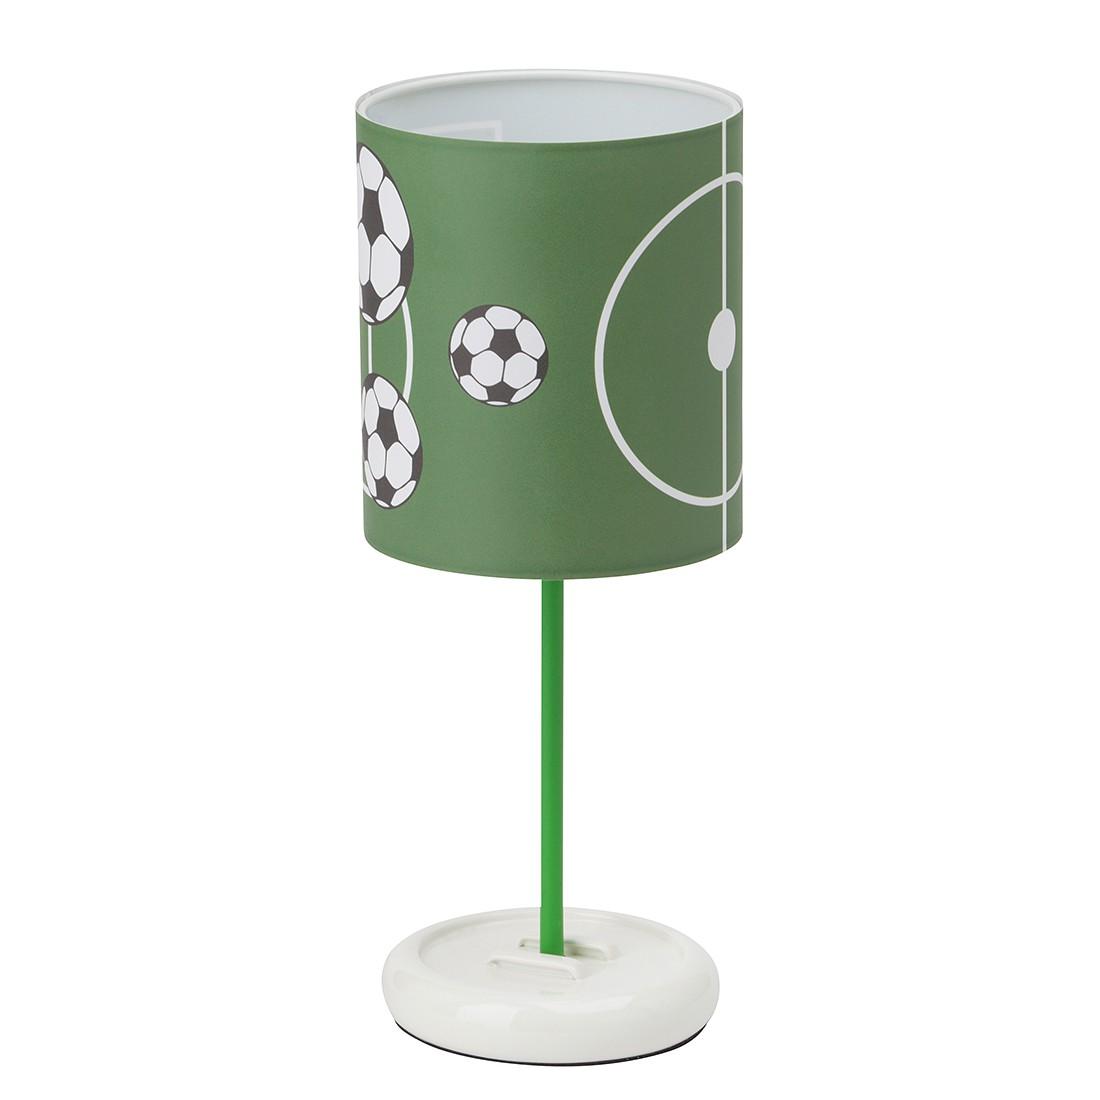 Tischleuchte Soccer ● Metall/Kunststoff ● Multicolor ● 12-flammig- Brilliant A+